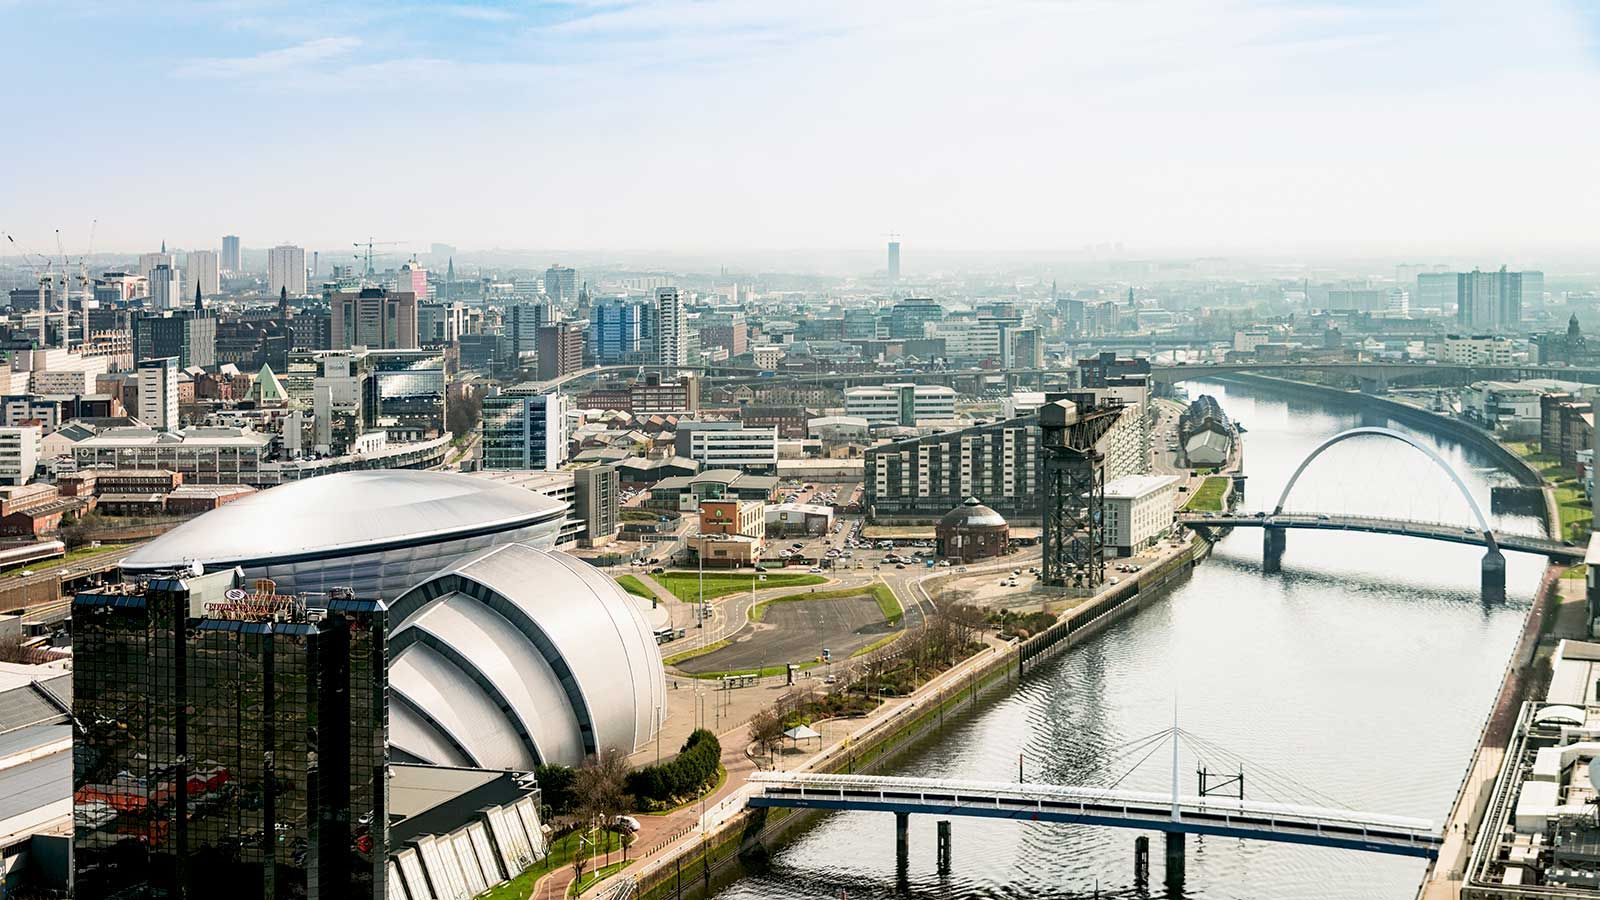 Scottish Enterprise LCIP, Glasgow Skyline River View - Mace Group